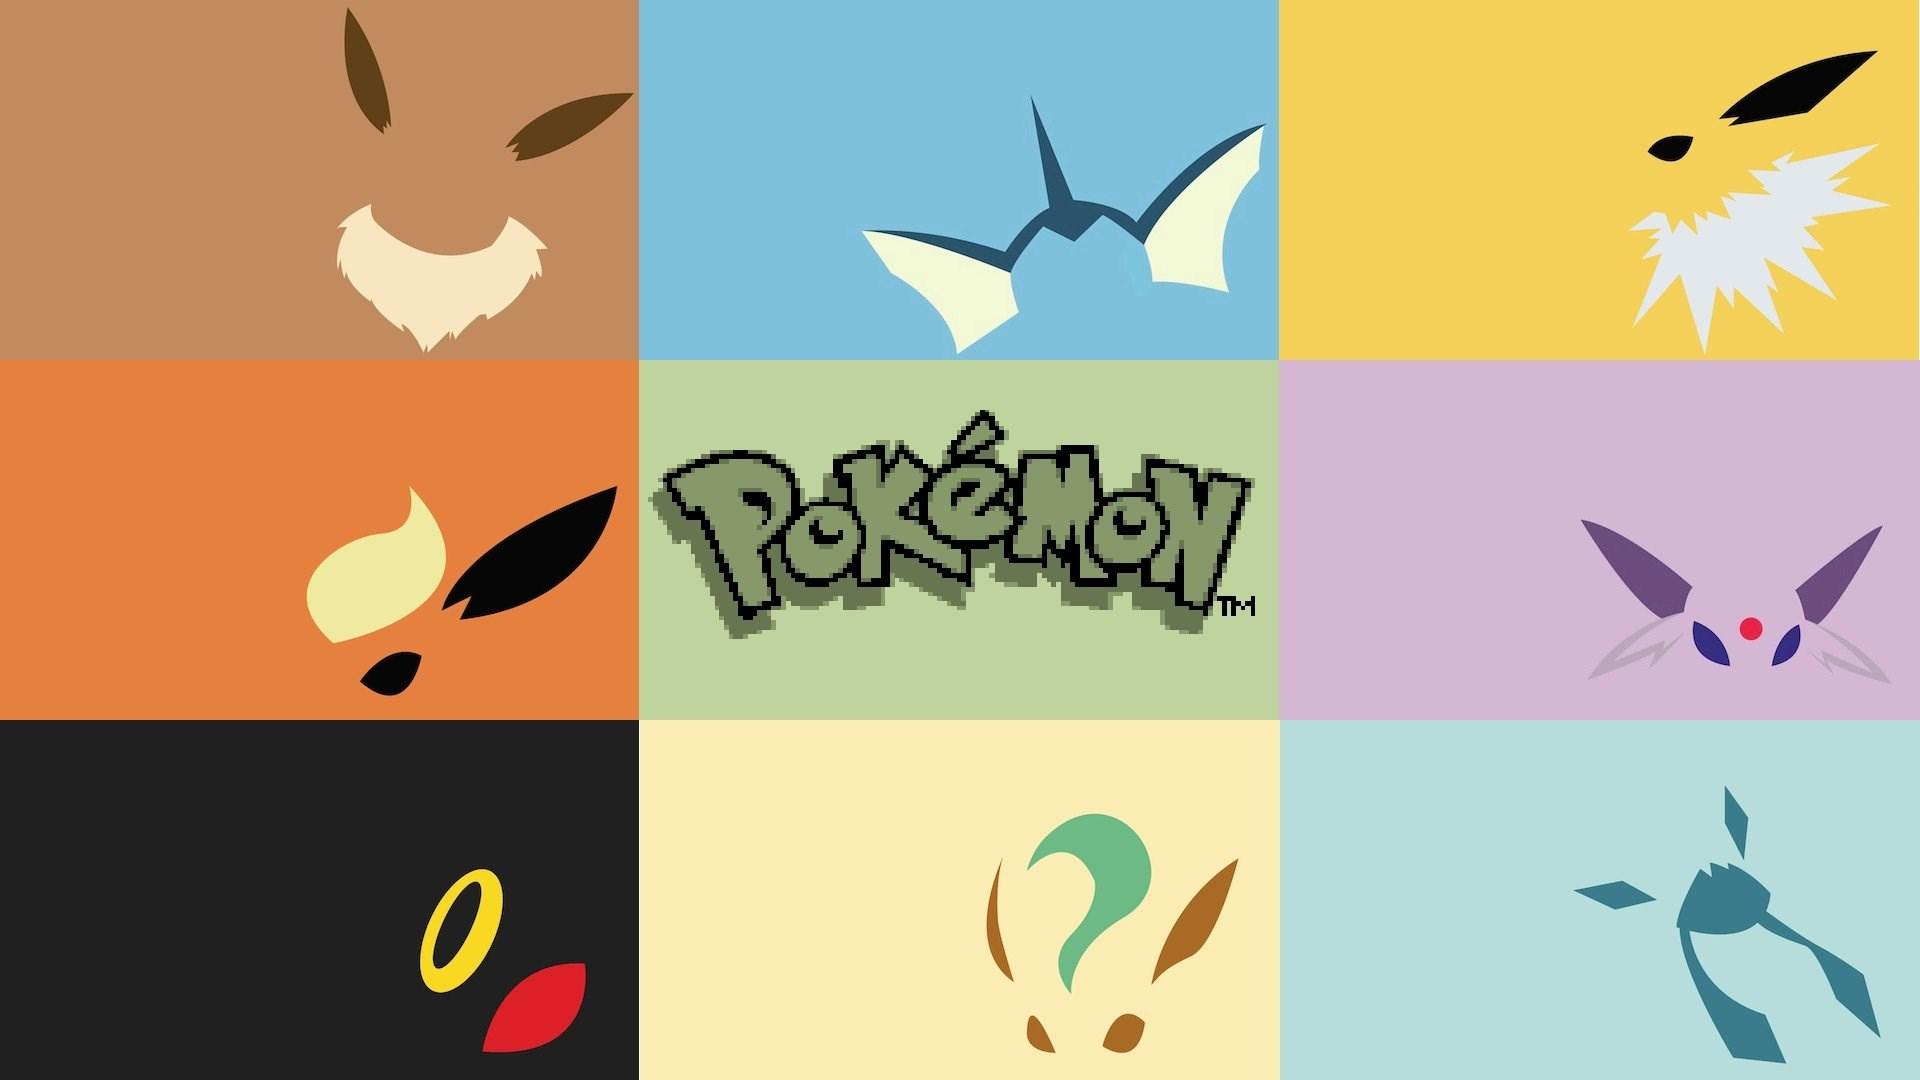 hd-pokemon-phone-eevee-photos-wallpaper-wpc5805775